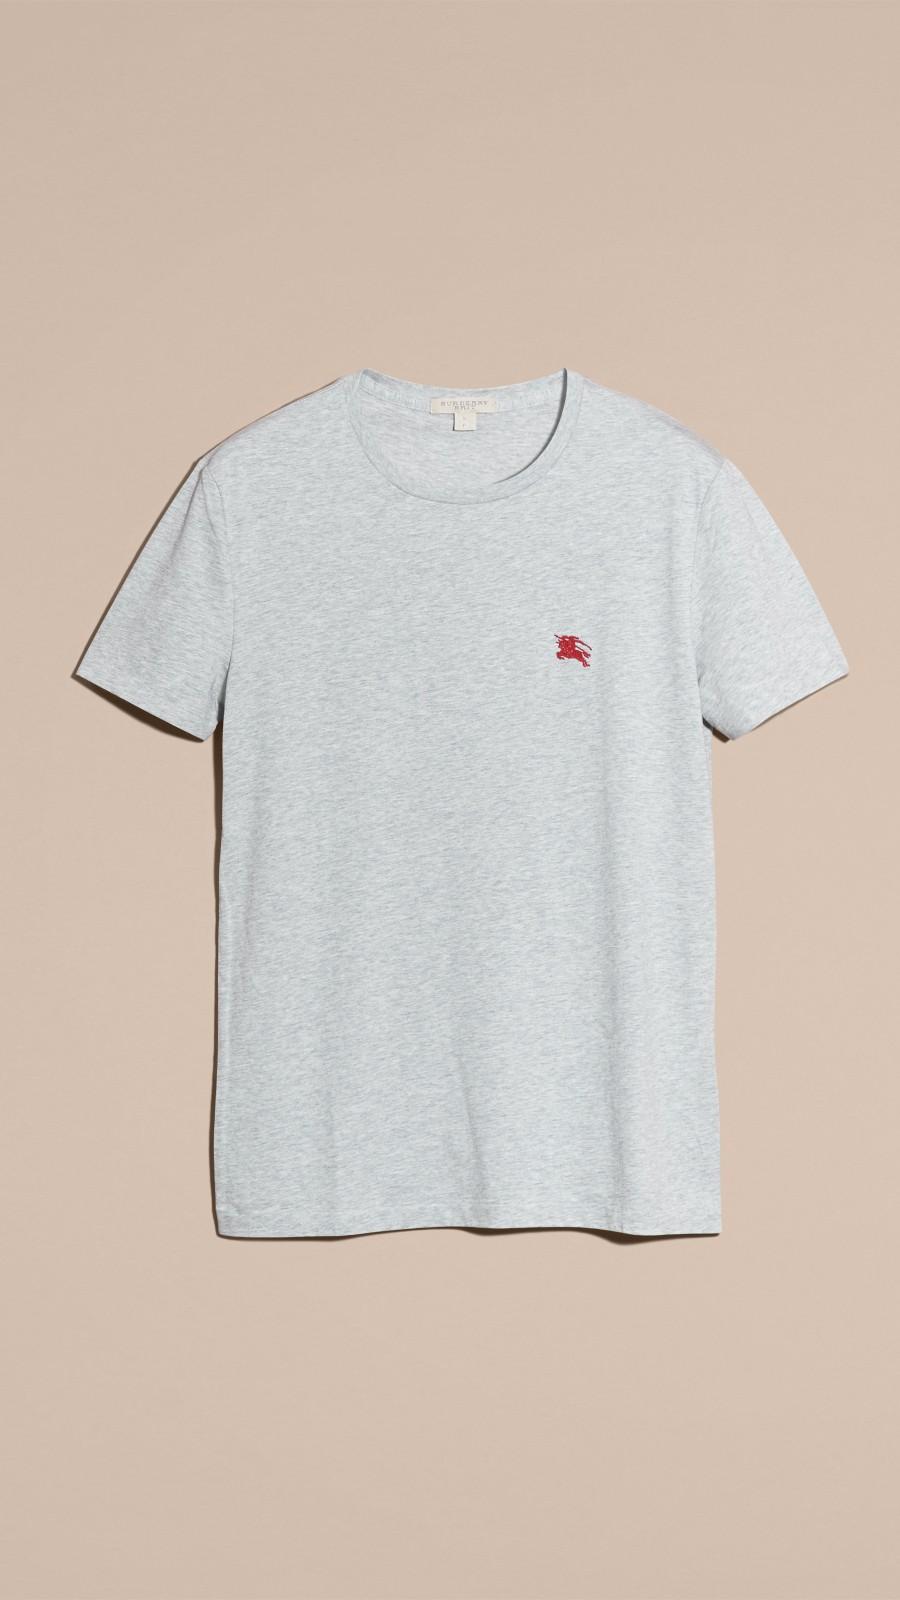 Pale grey melange Liquid-soft Cotton T-Shirt Pale Grey Melange - Image 4